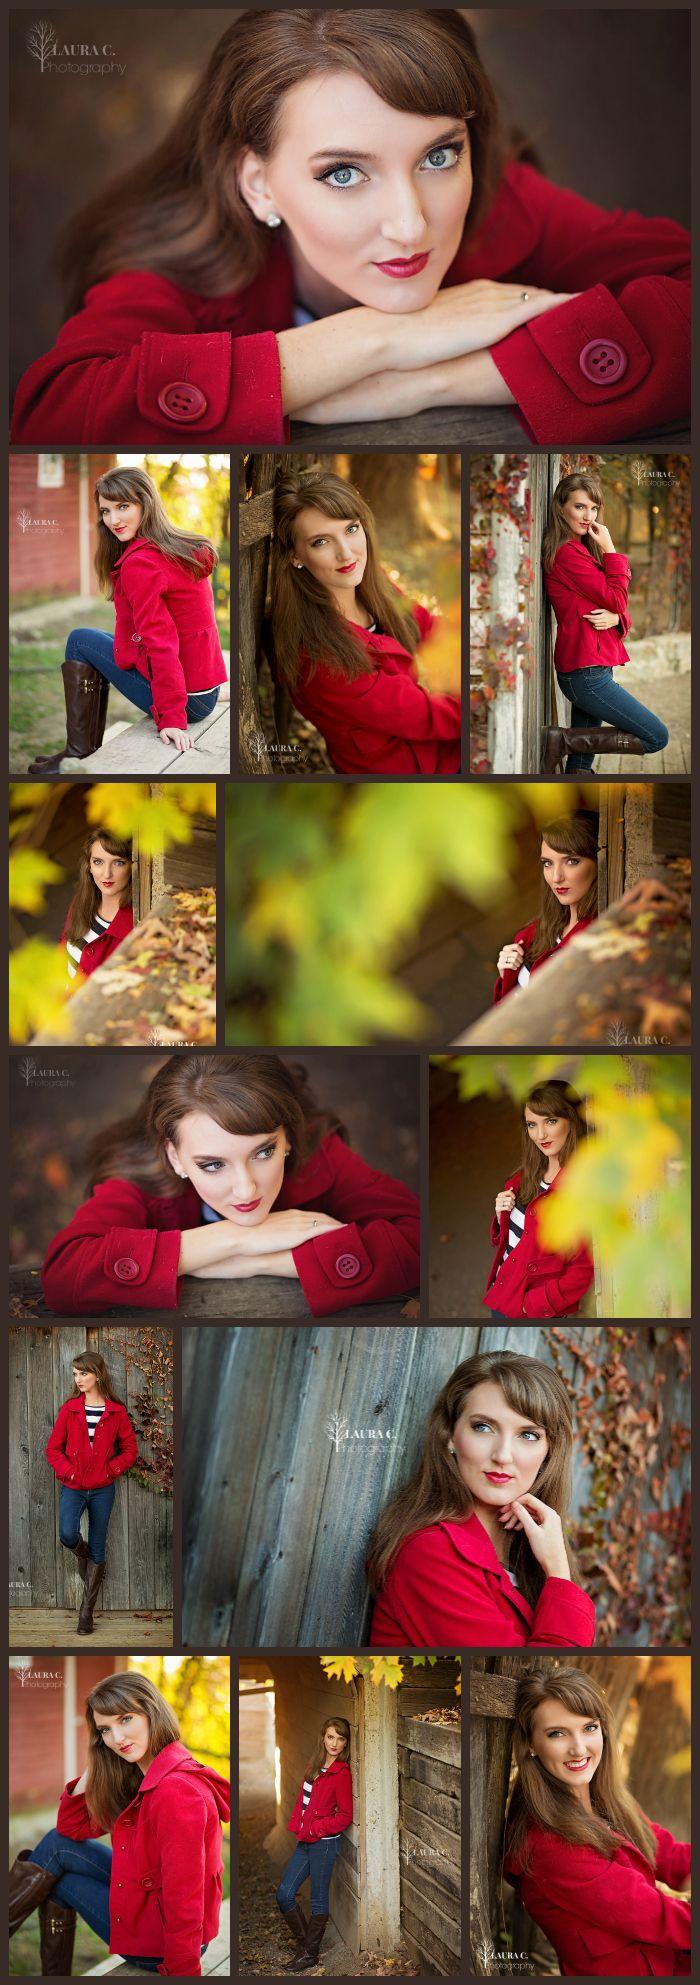 Erin Cejka | 2016 Senior | Senior Portraits | What to Wear for Senior Portraits | Poses for Senior Girls | Red Pea Coat | Farm | Rural | Fall Senior Pictures | Laura C. Photography 2015 | Photographer based in Gretna, NE